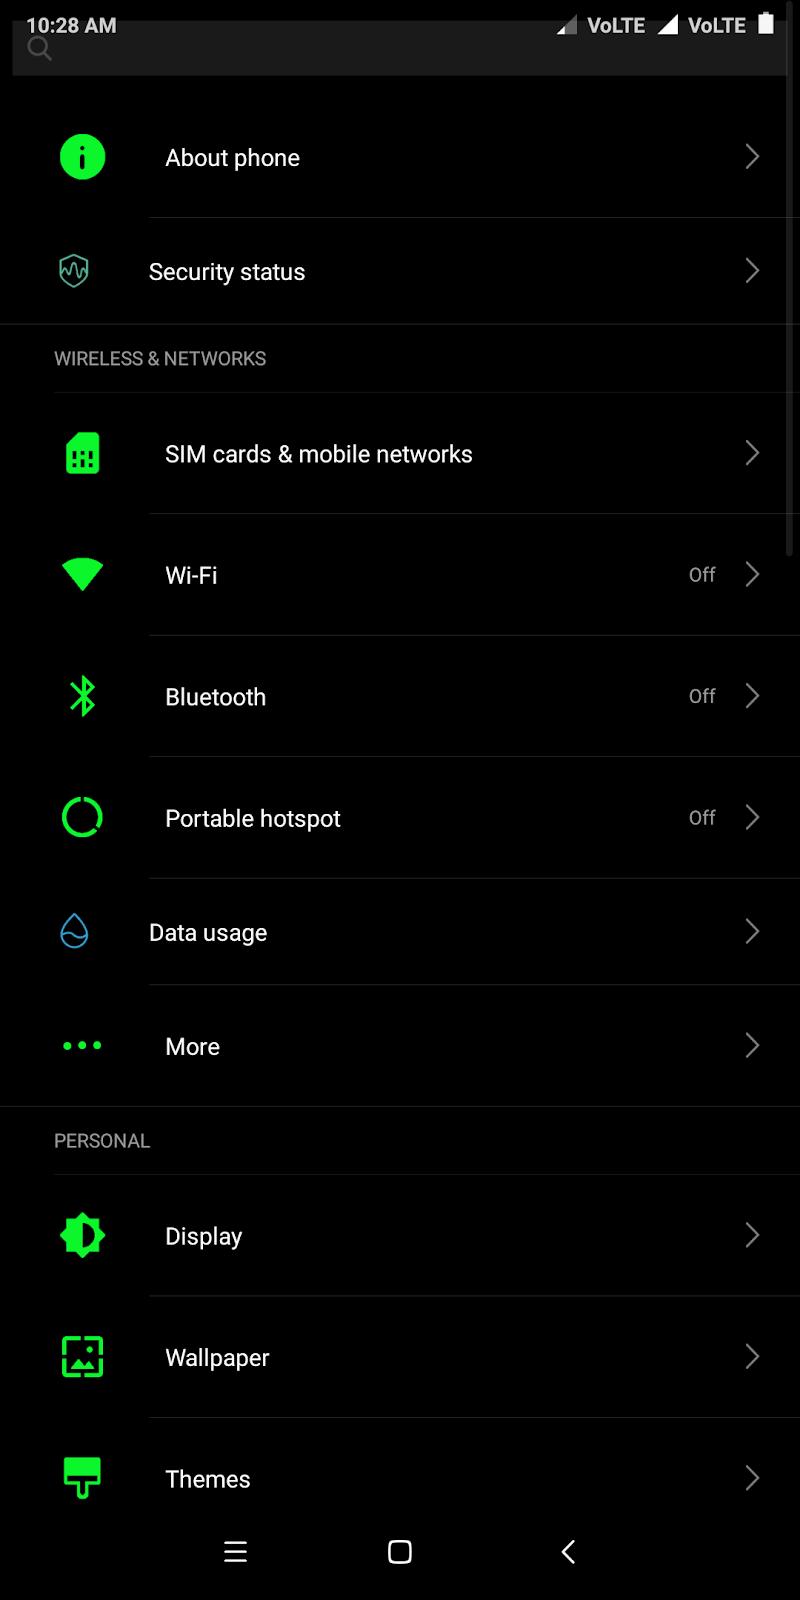 Xiaomi Manual download miui 10 beta rom for Redmi note 5a